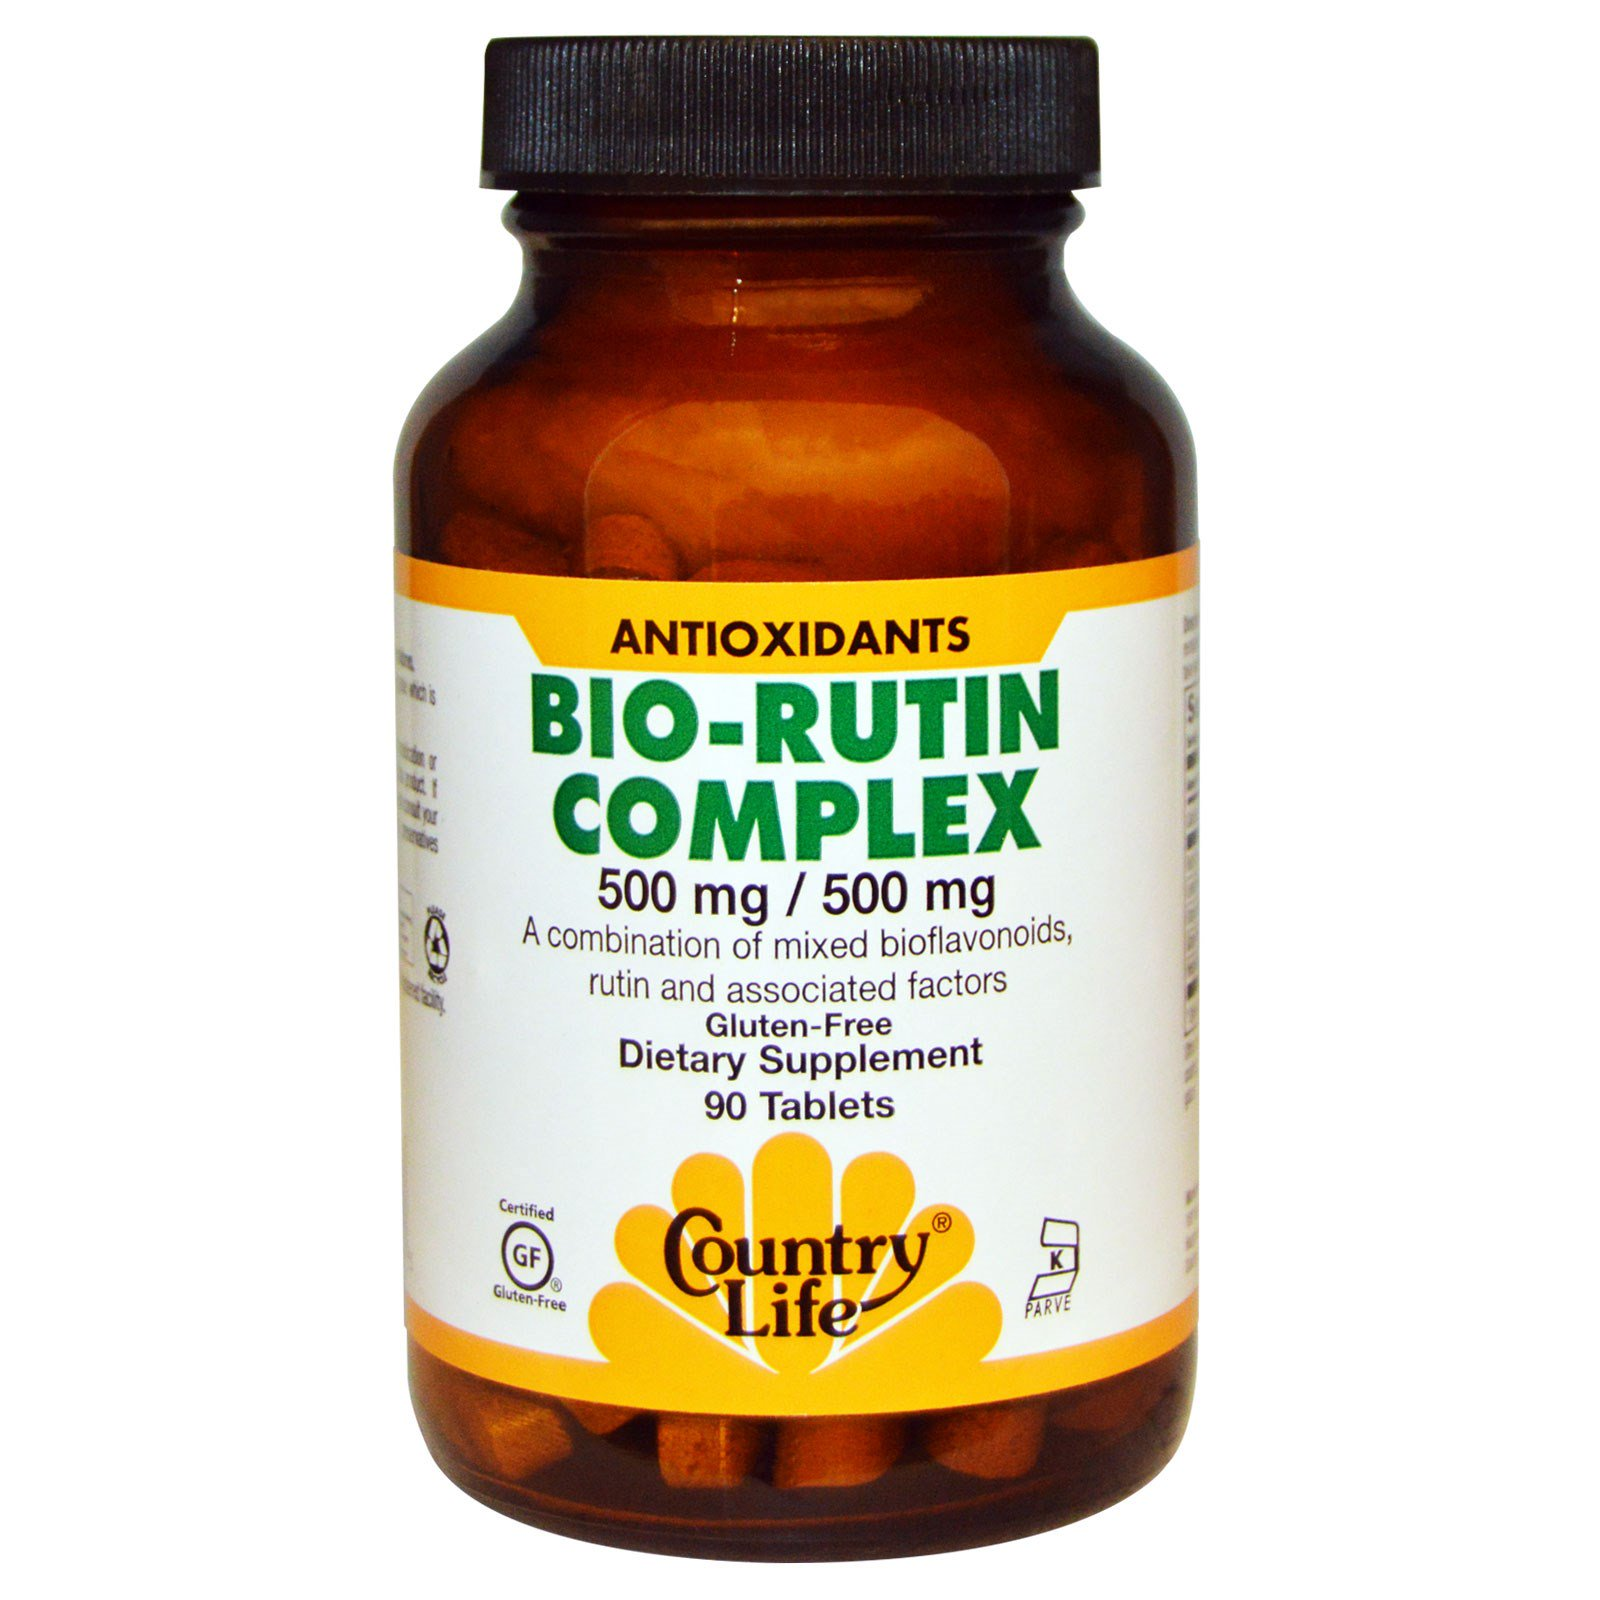 Country Life, Комплекс био-рутина, 500 мг / 500 мг, 90 таблеток